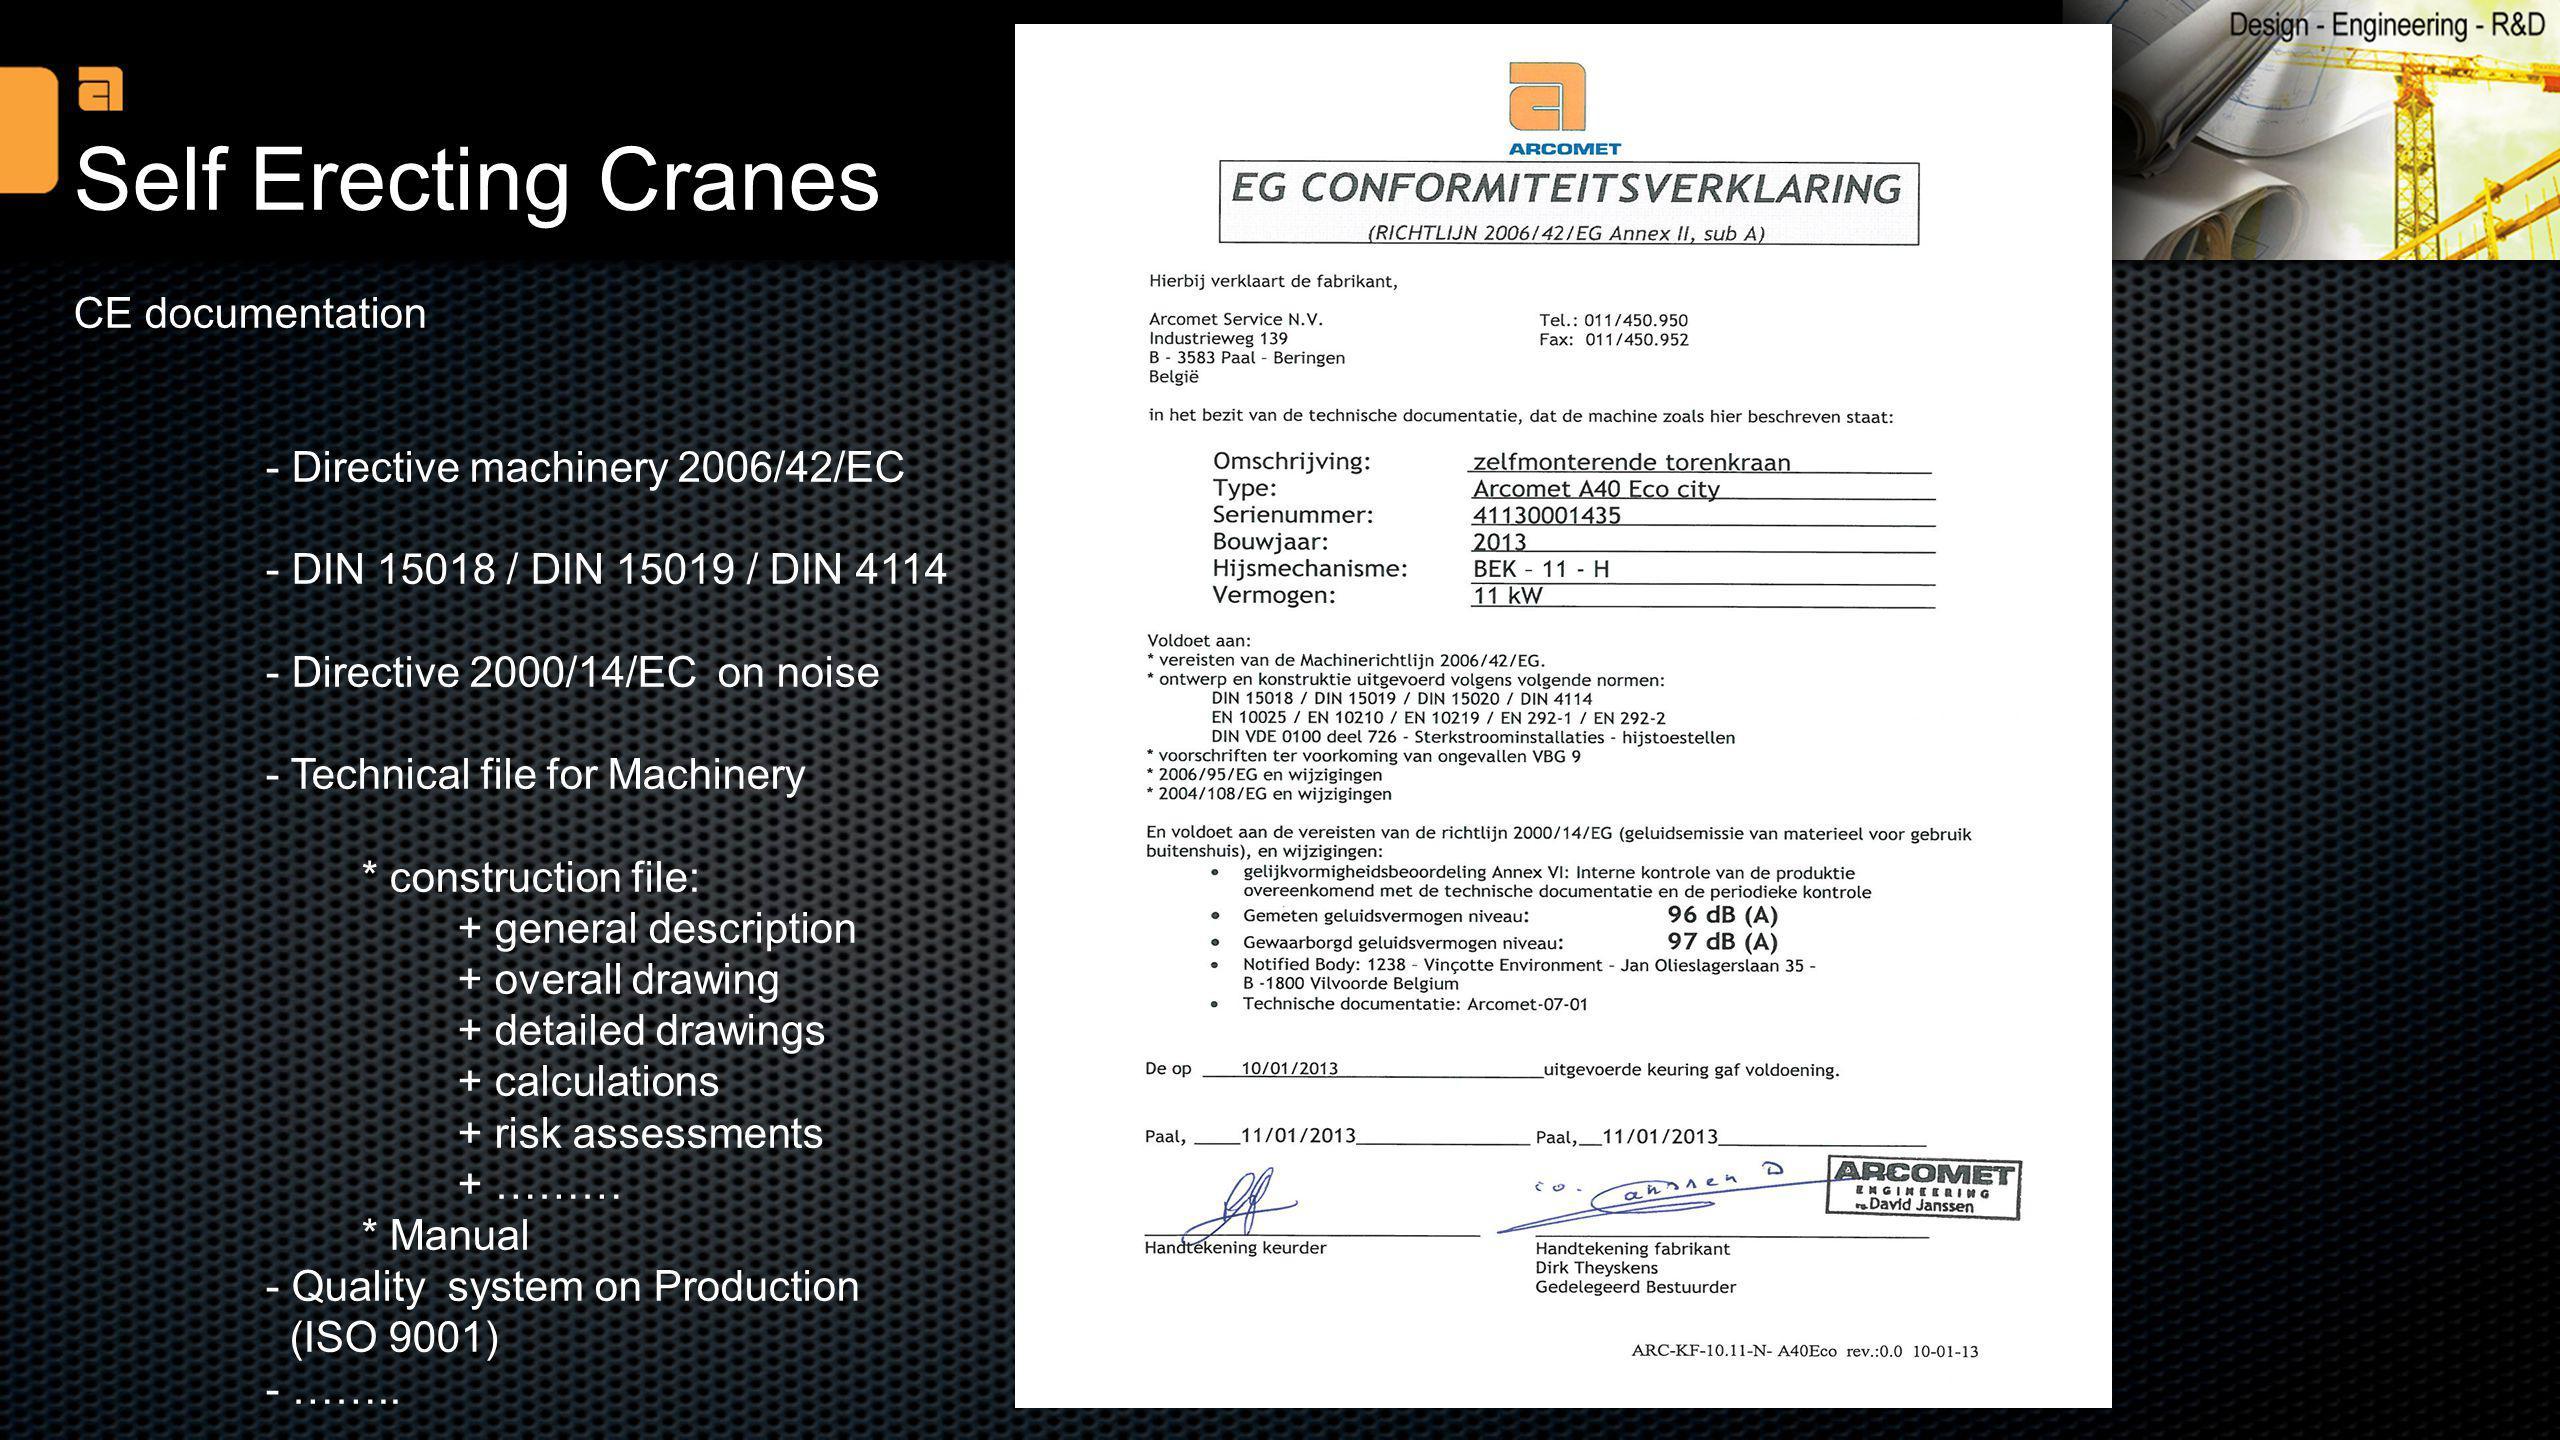 Self Erecting Cranes CE documentation - Directive machinery 2006/42/EC